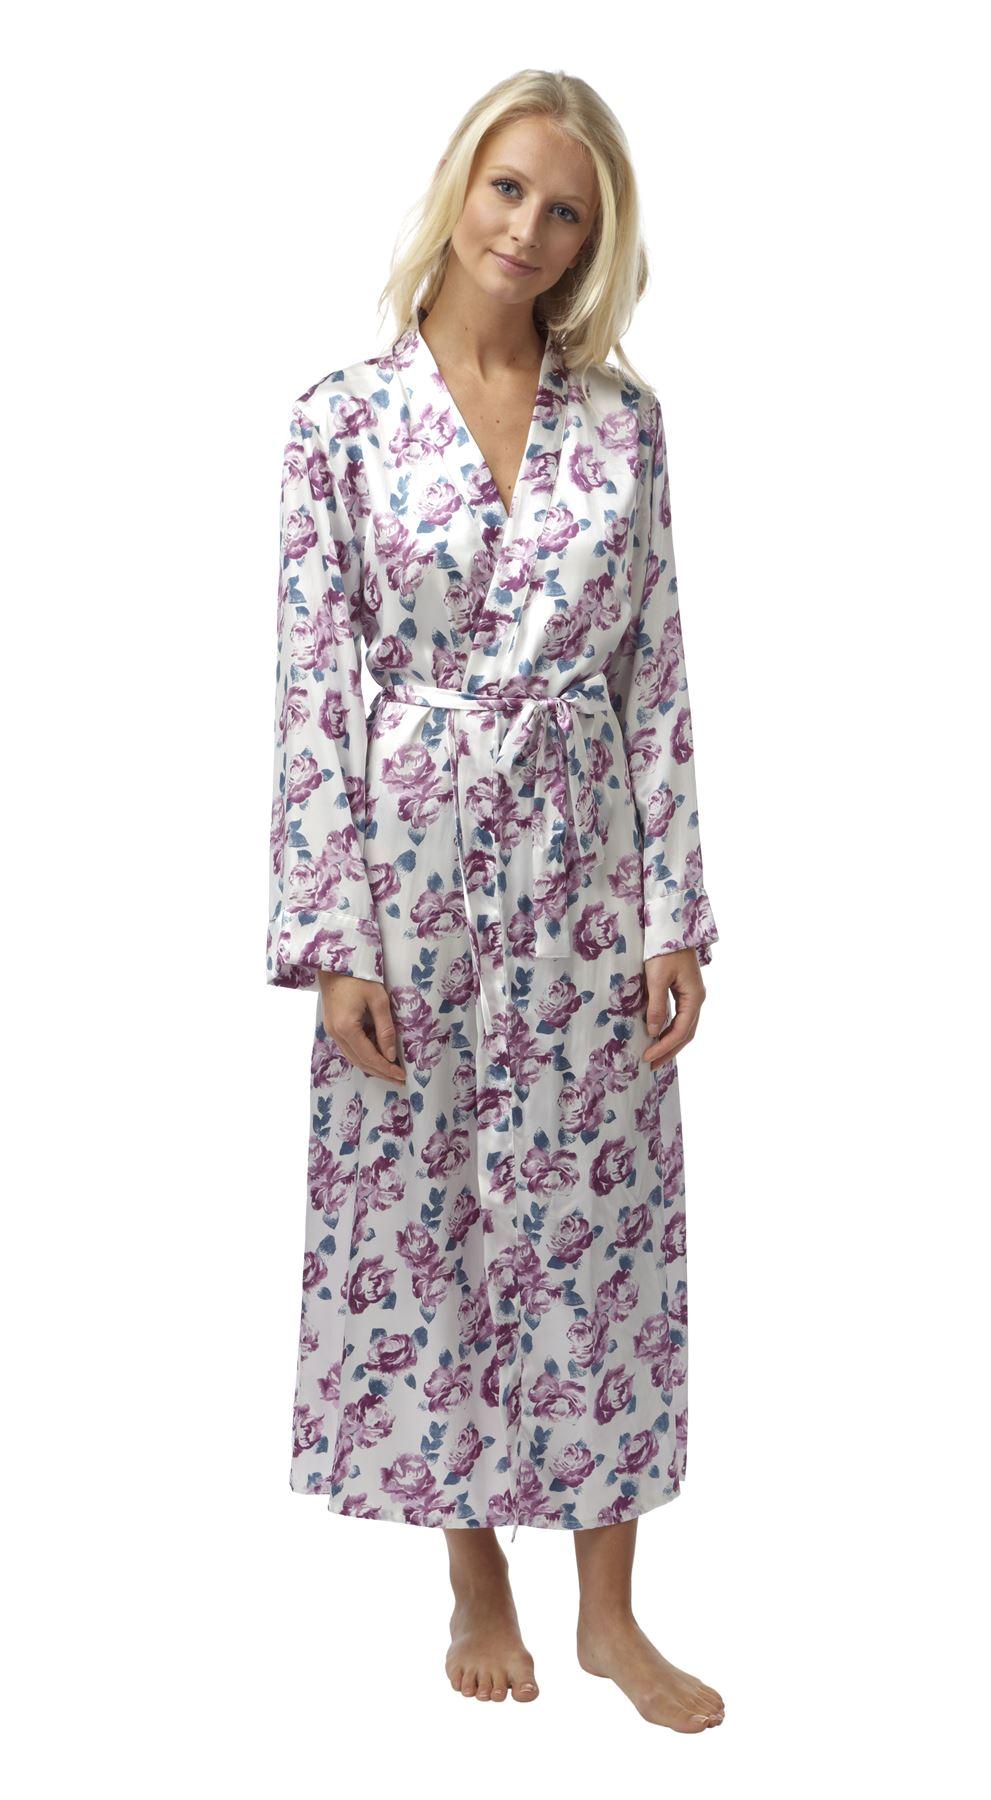 Women's Bathrobe Price Luxury Women S Floral Satin Lace Gown Designer Robe Wrap